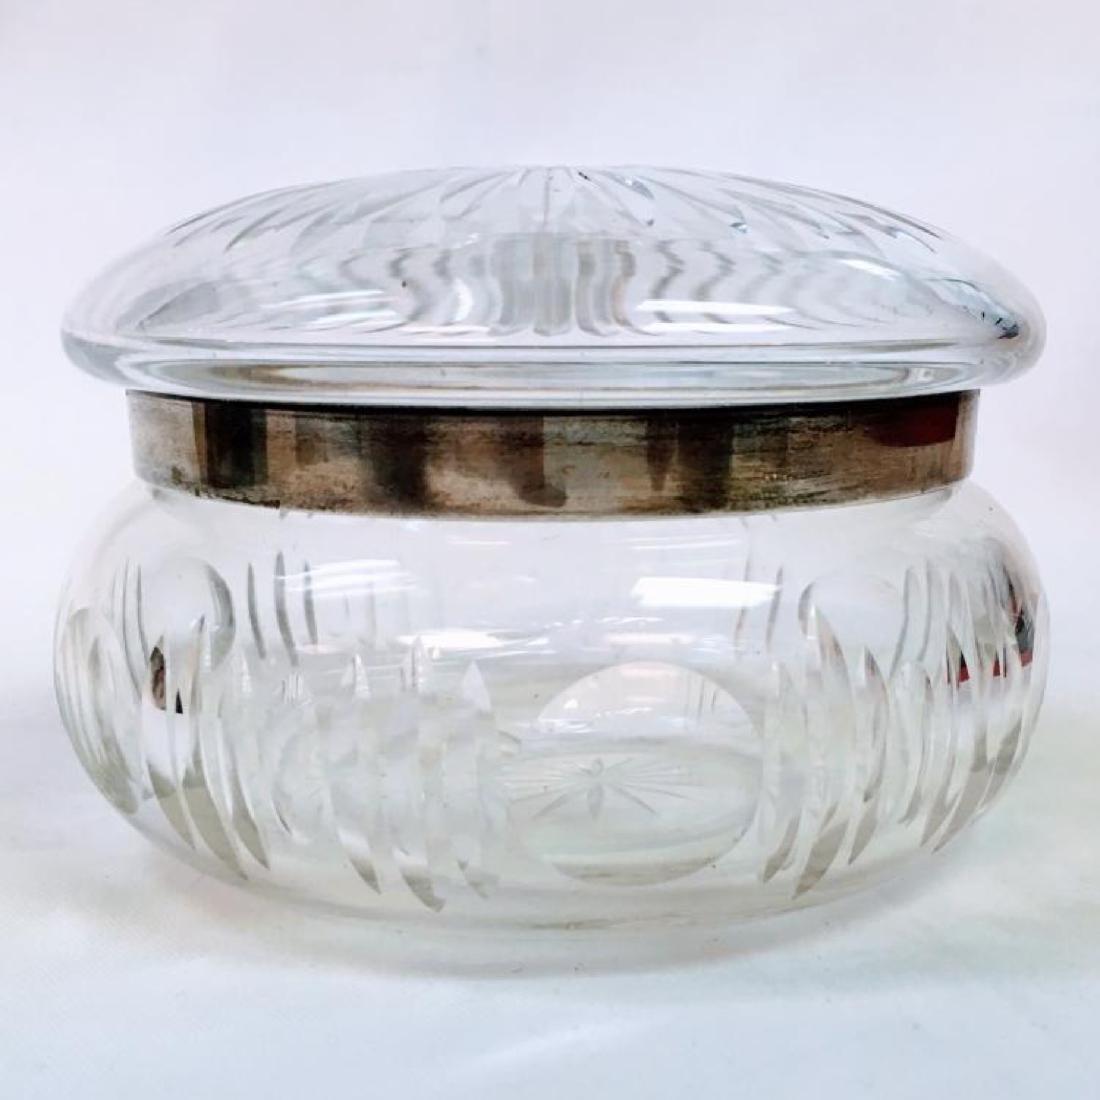 ANTIQUE STERLING SILVER LIDDED CUT GLASS POWDER JAR - 4